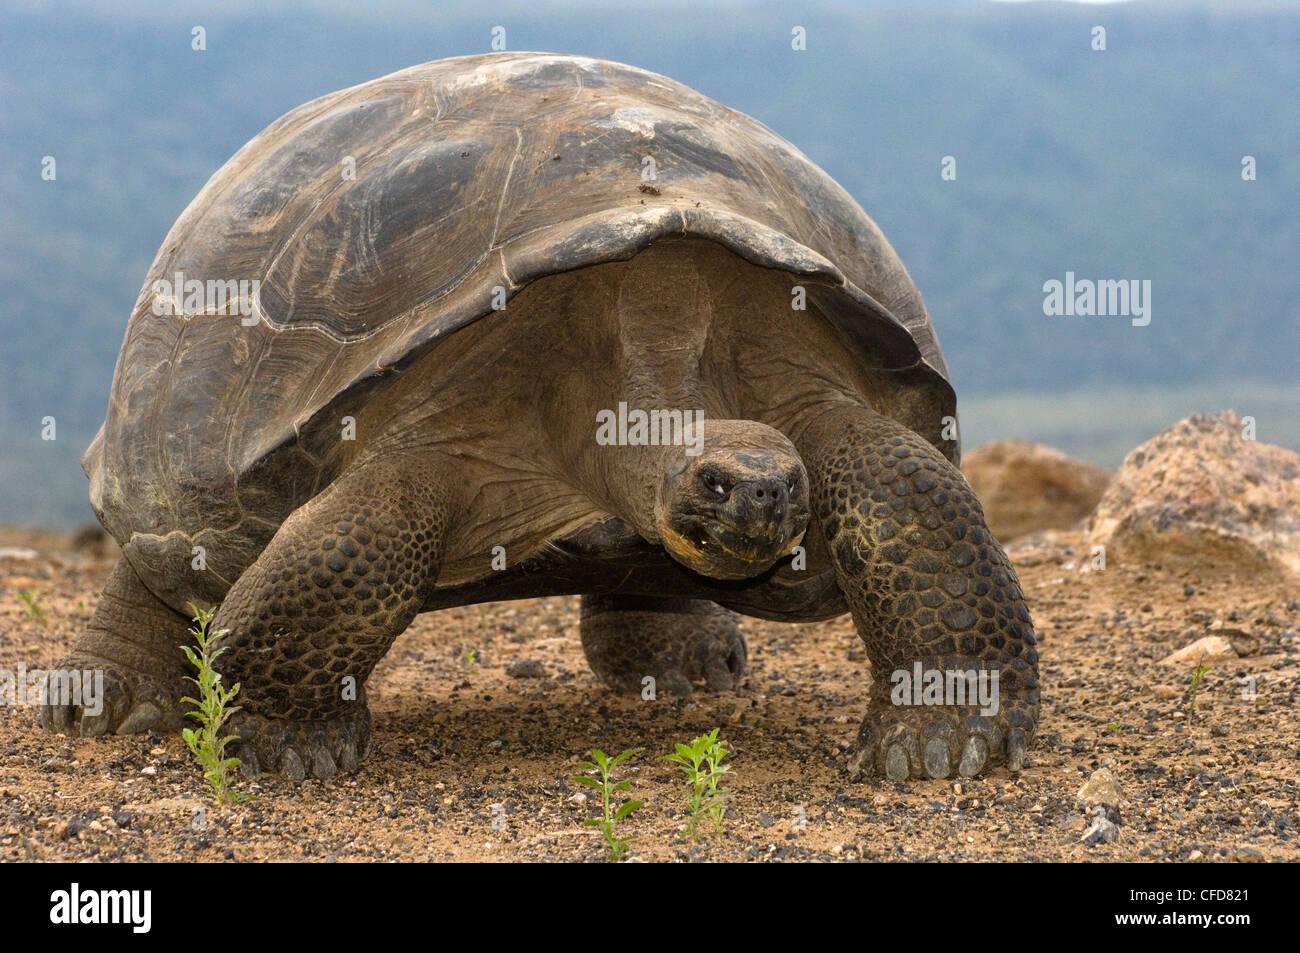 Galapagos-Riesenschildkröte, Alcedo Vulkans Kraterboden, Isabela Island, Galapagos-Inseln, Ecuador, Südamerika. Stockbild